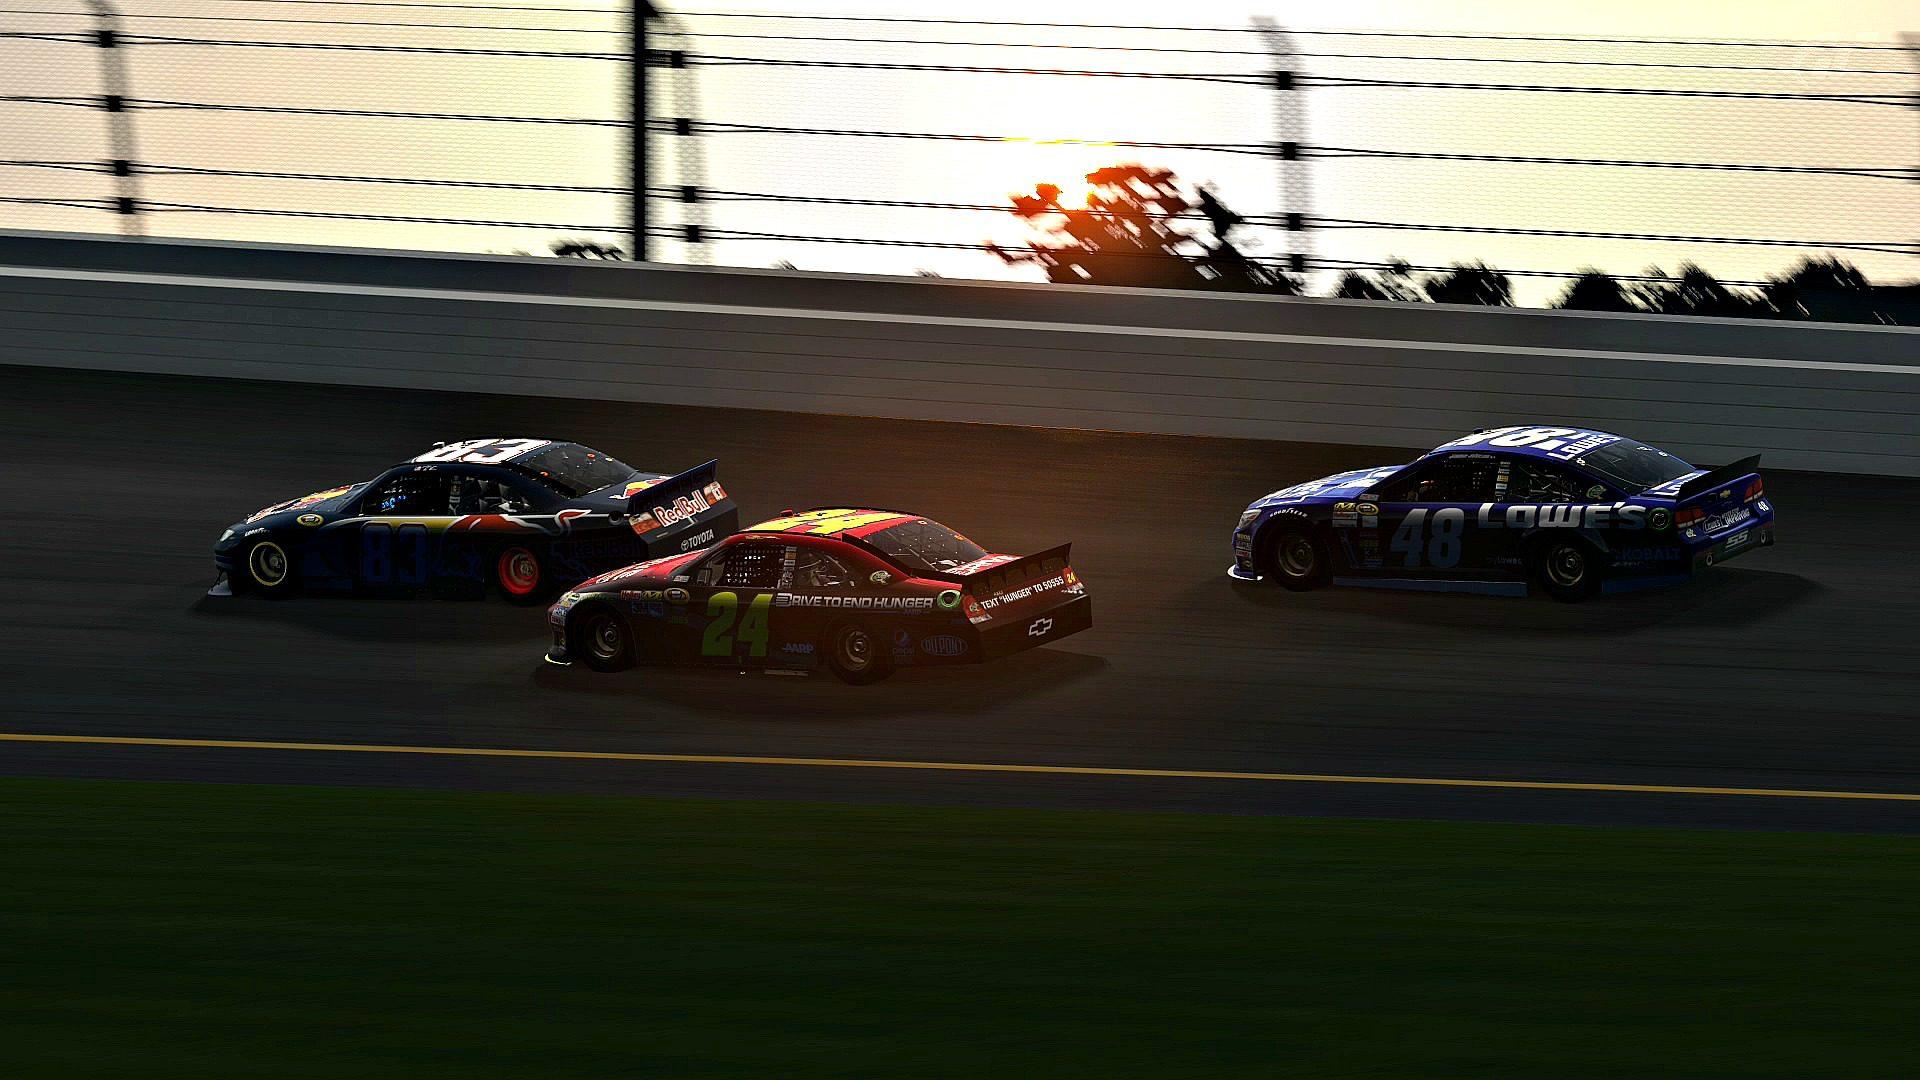 DIS22-NASCARatSunset1.jpg